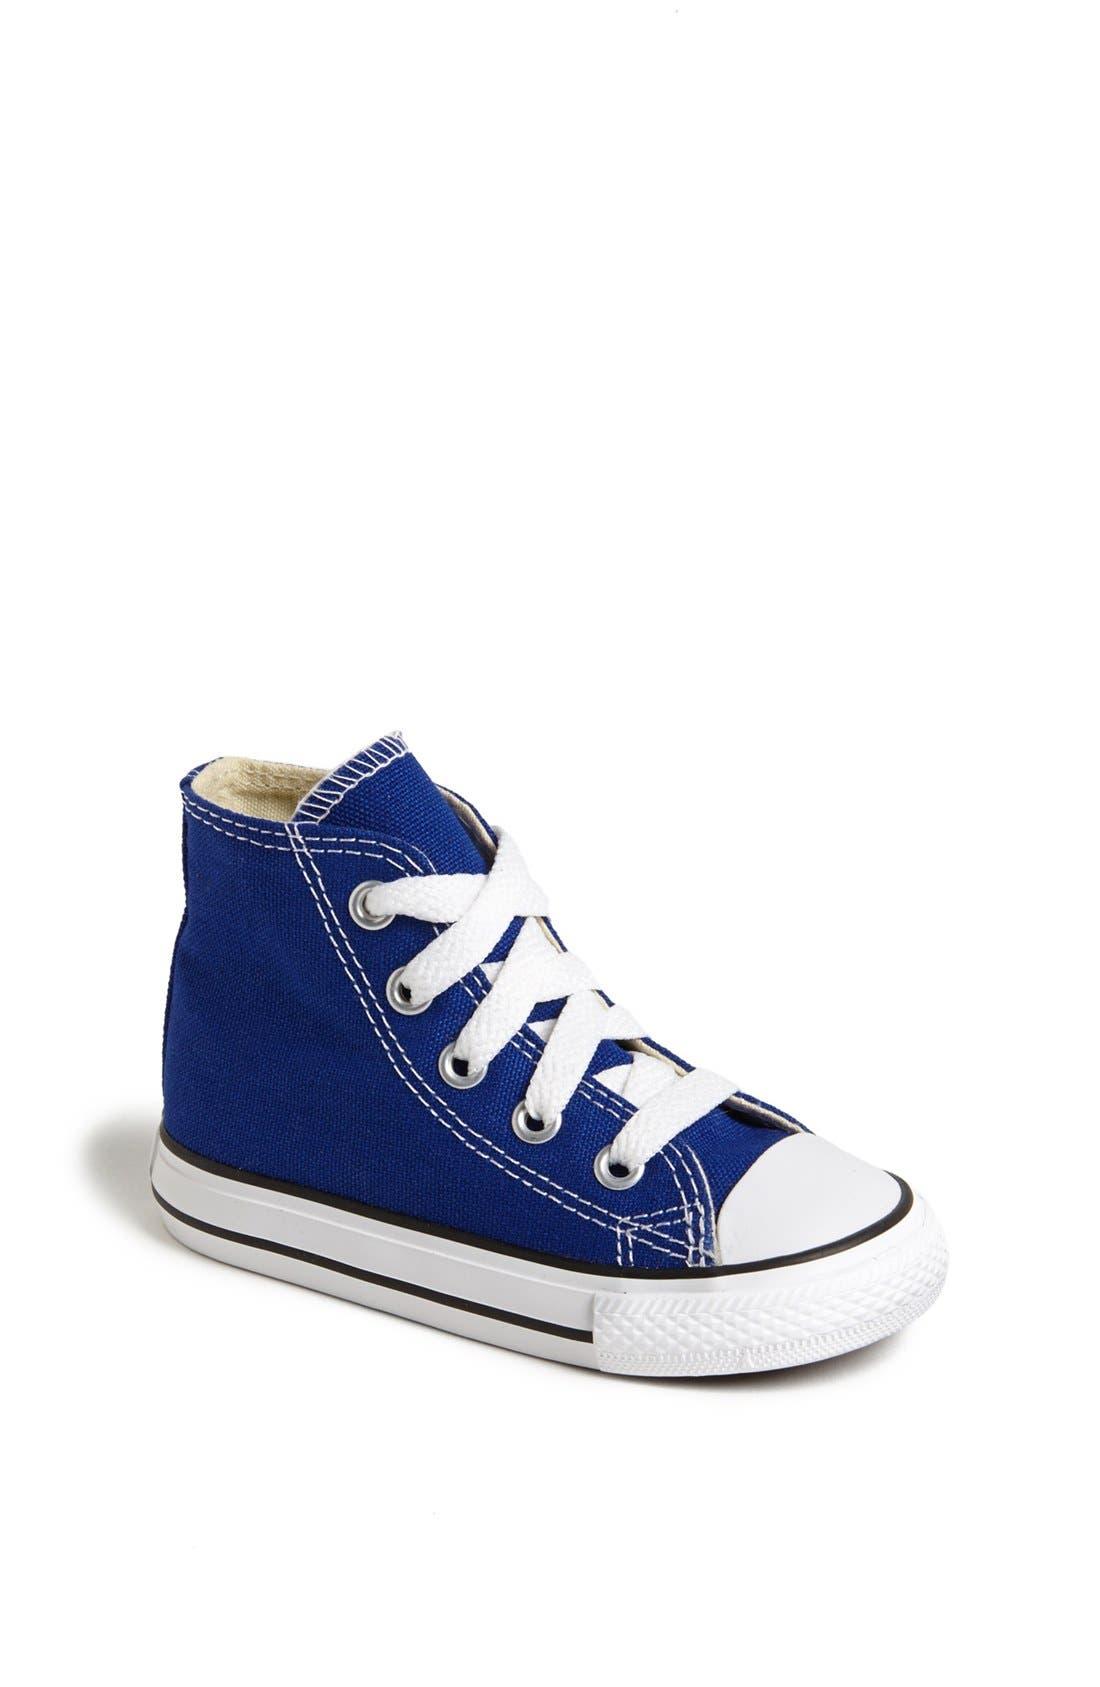 Main Image - Converse Chuck Taylor® All Star® High Top Sneaker (Baby, Walker, Toddler & Little Kid)